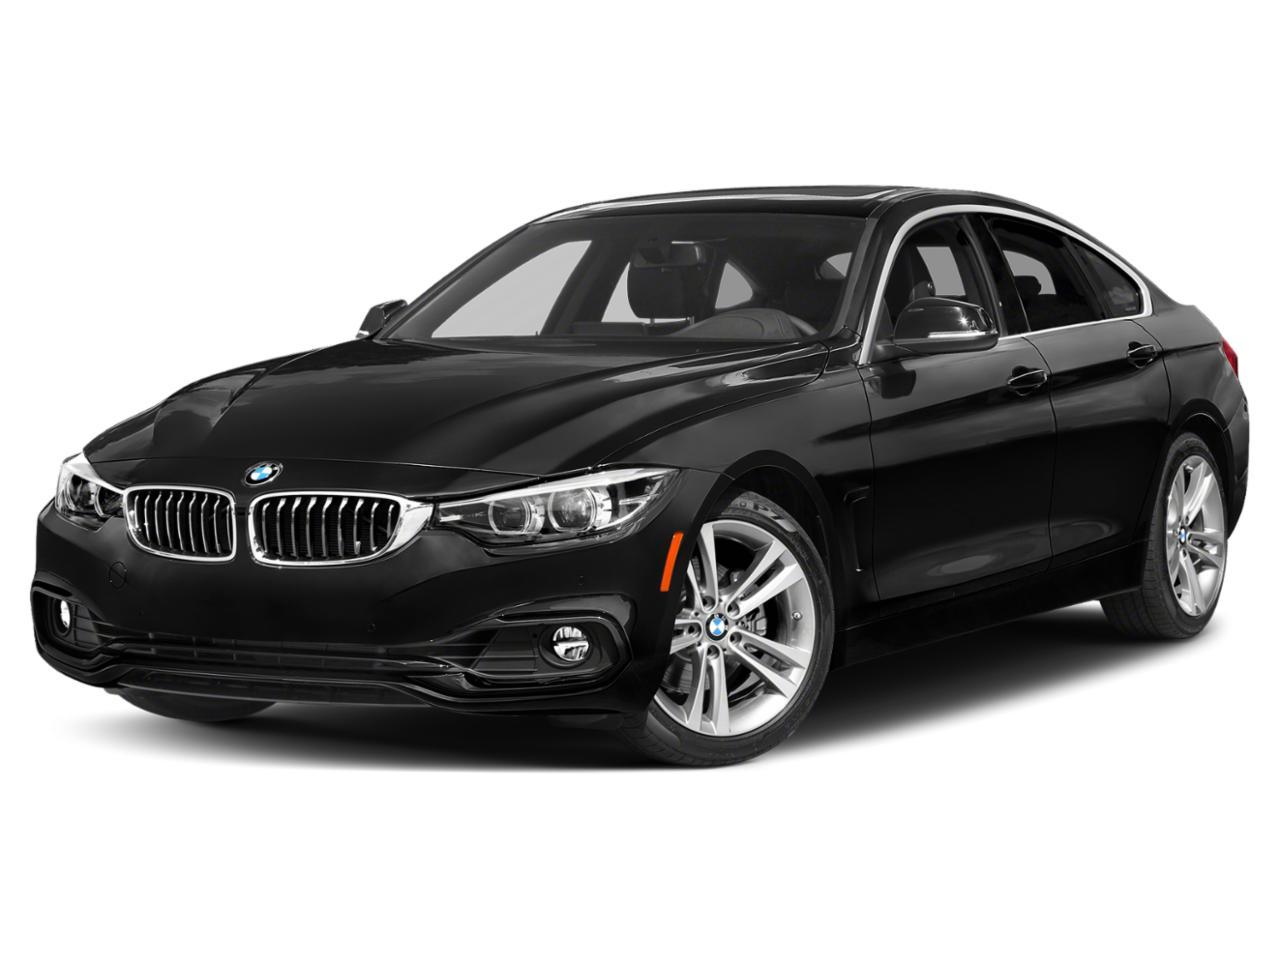 2019 BMW 430i Vehicle Photo in Pleasanton, CA 94588